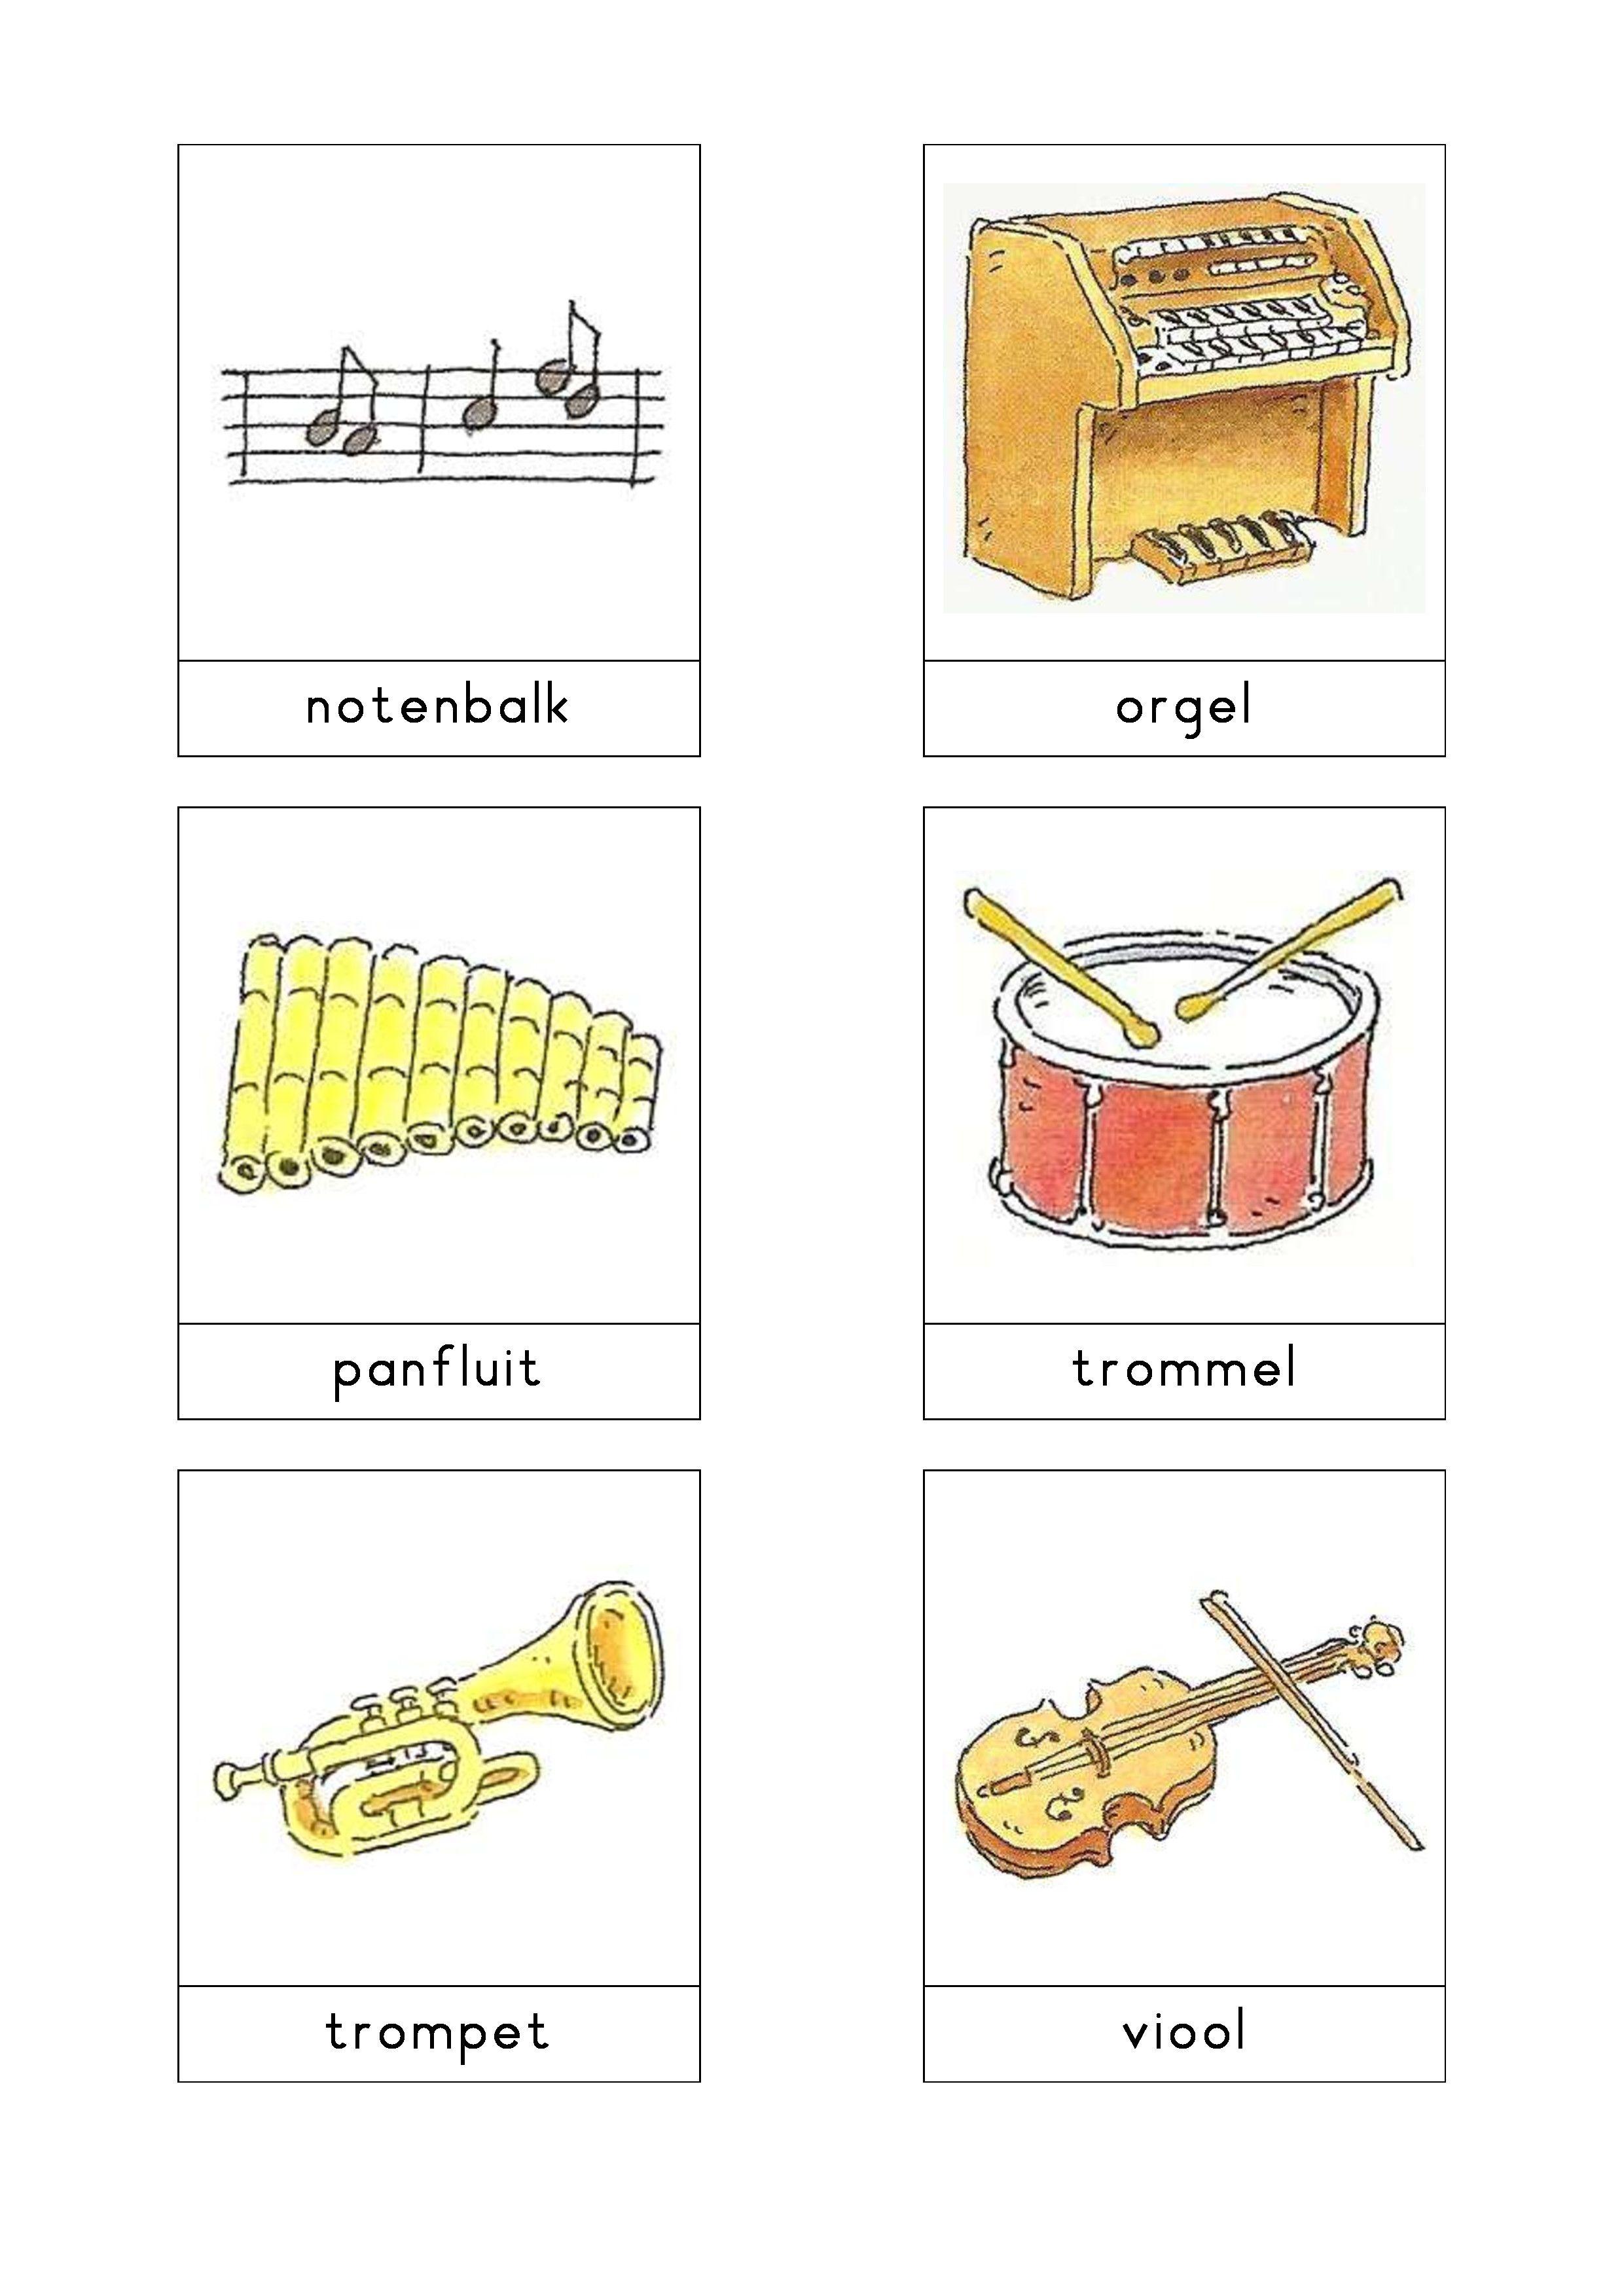 Pin Van Teresa Conant Op Muziek Muziek Activiteiten Wereldmuziek Muziek